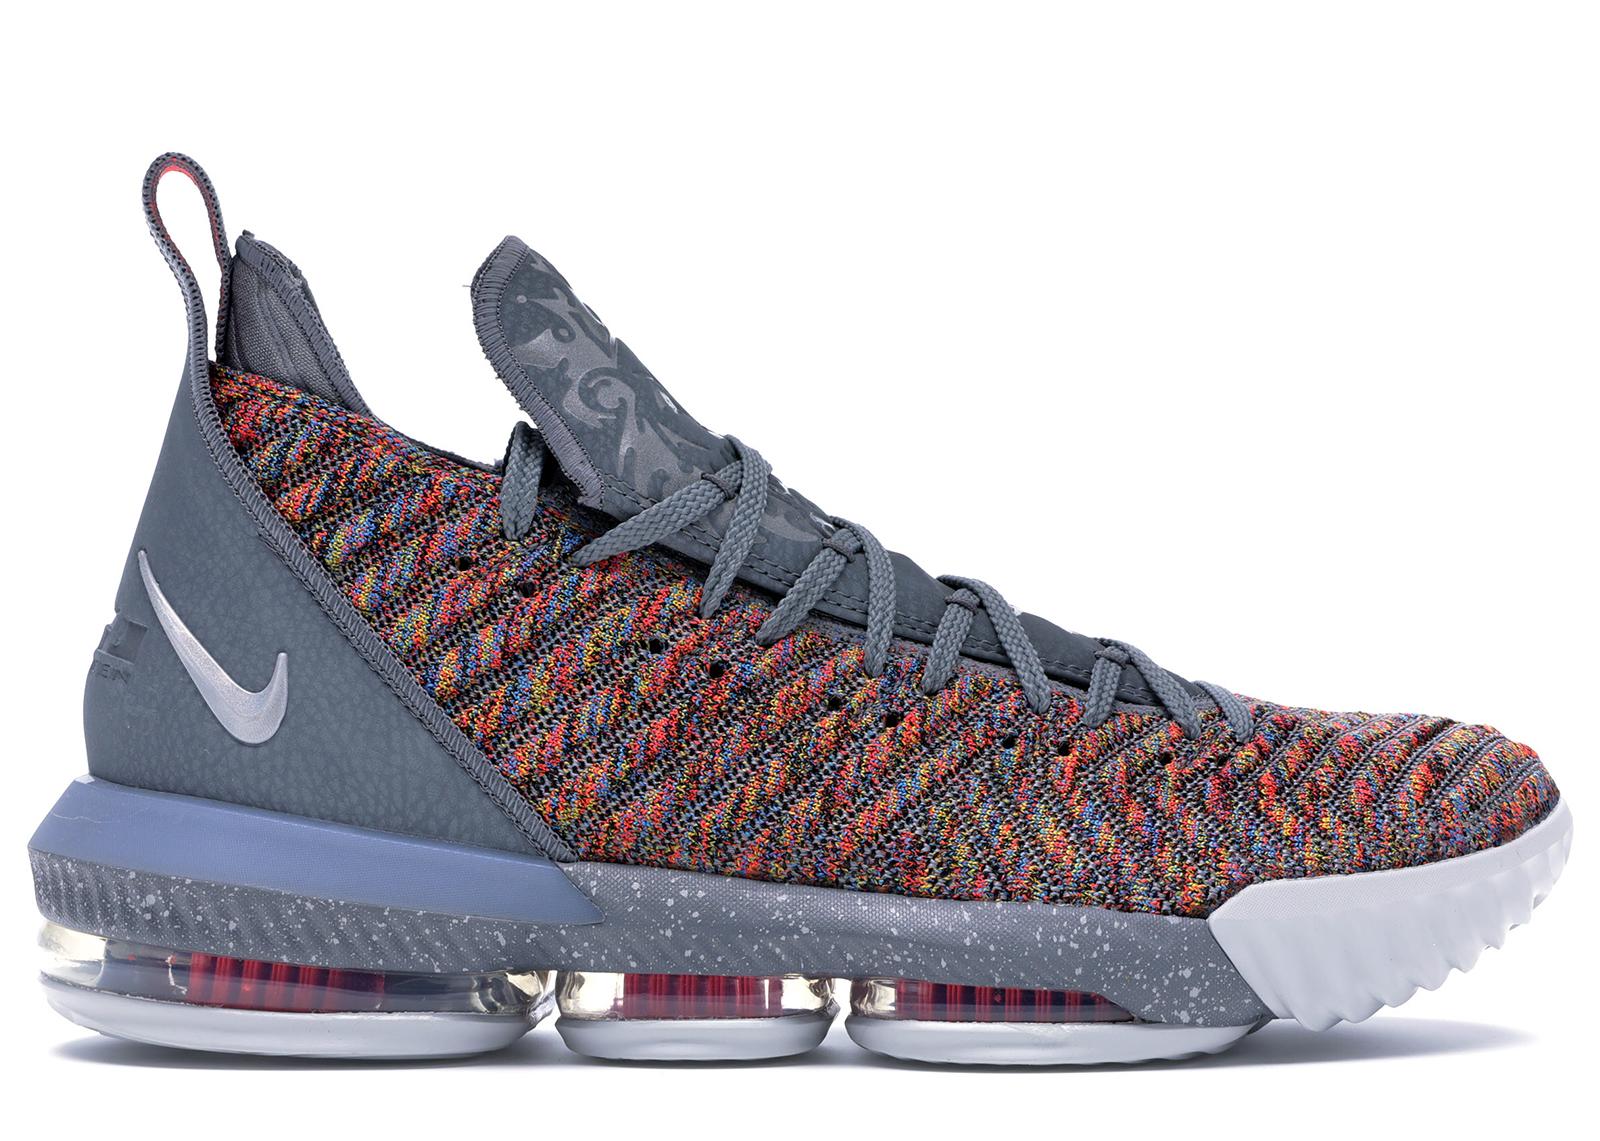 Nike LeBron 16 Multi-Color - BQ5969-900